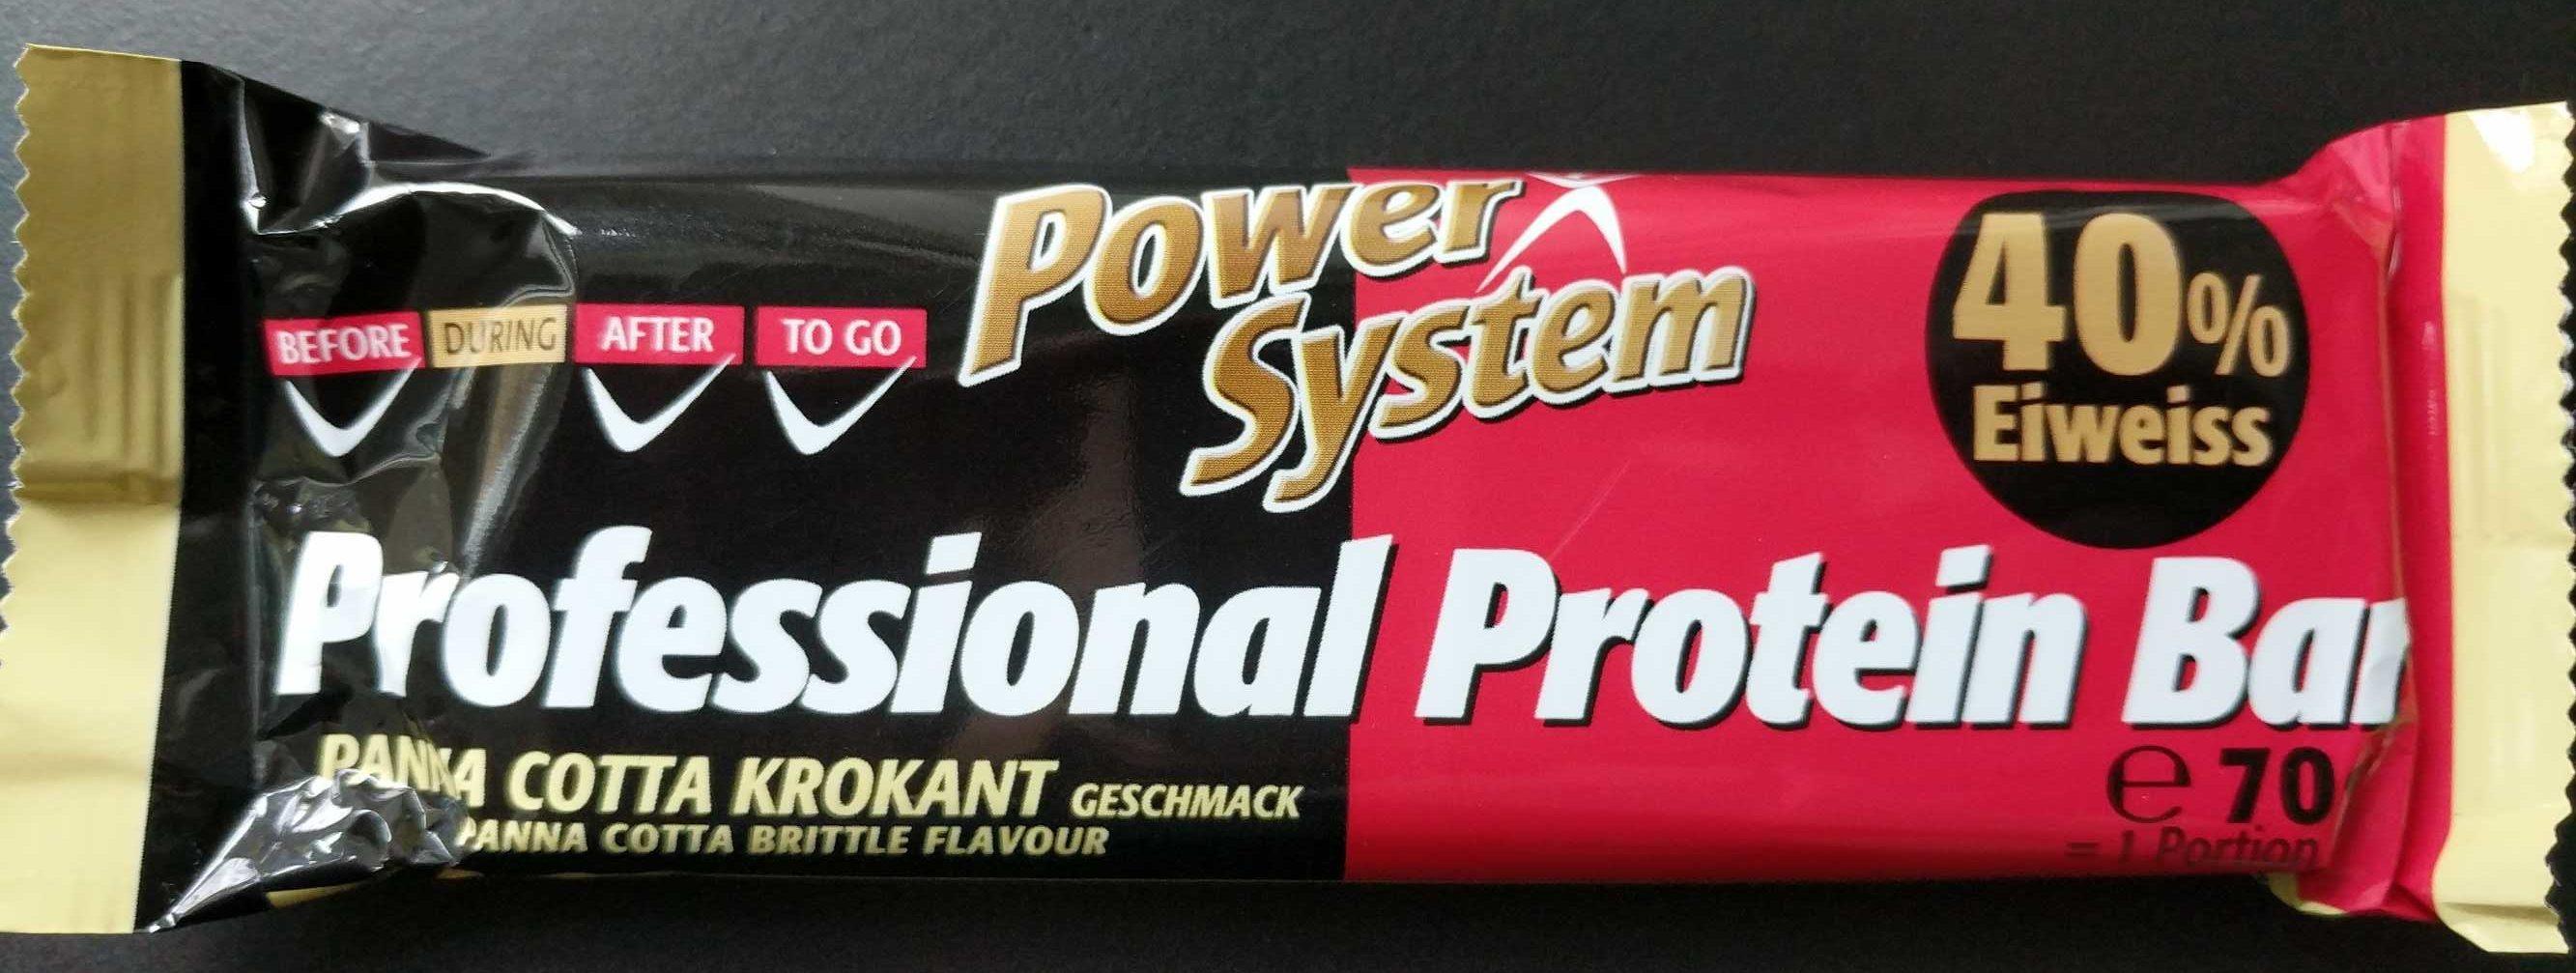 Professional Protein Bar Panna Cotta Krokant Geschmack - Produit - de